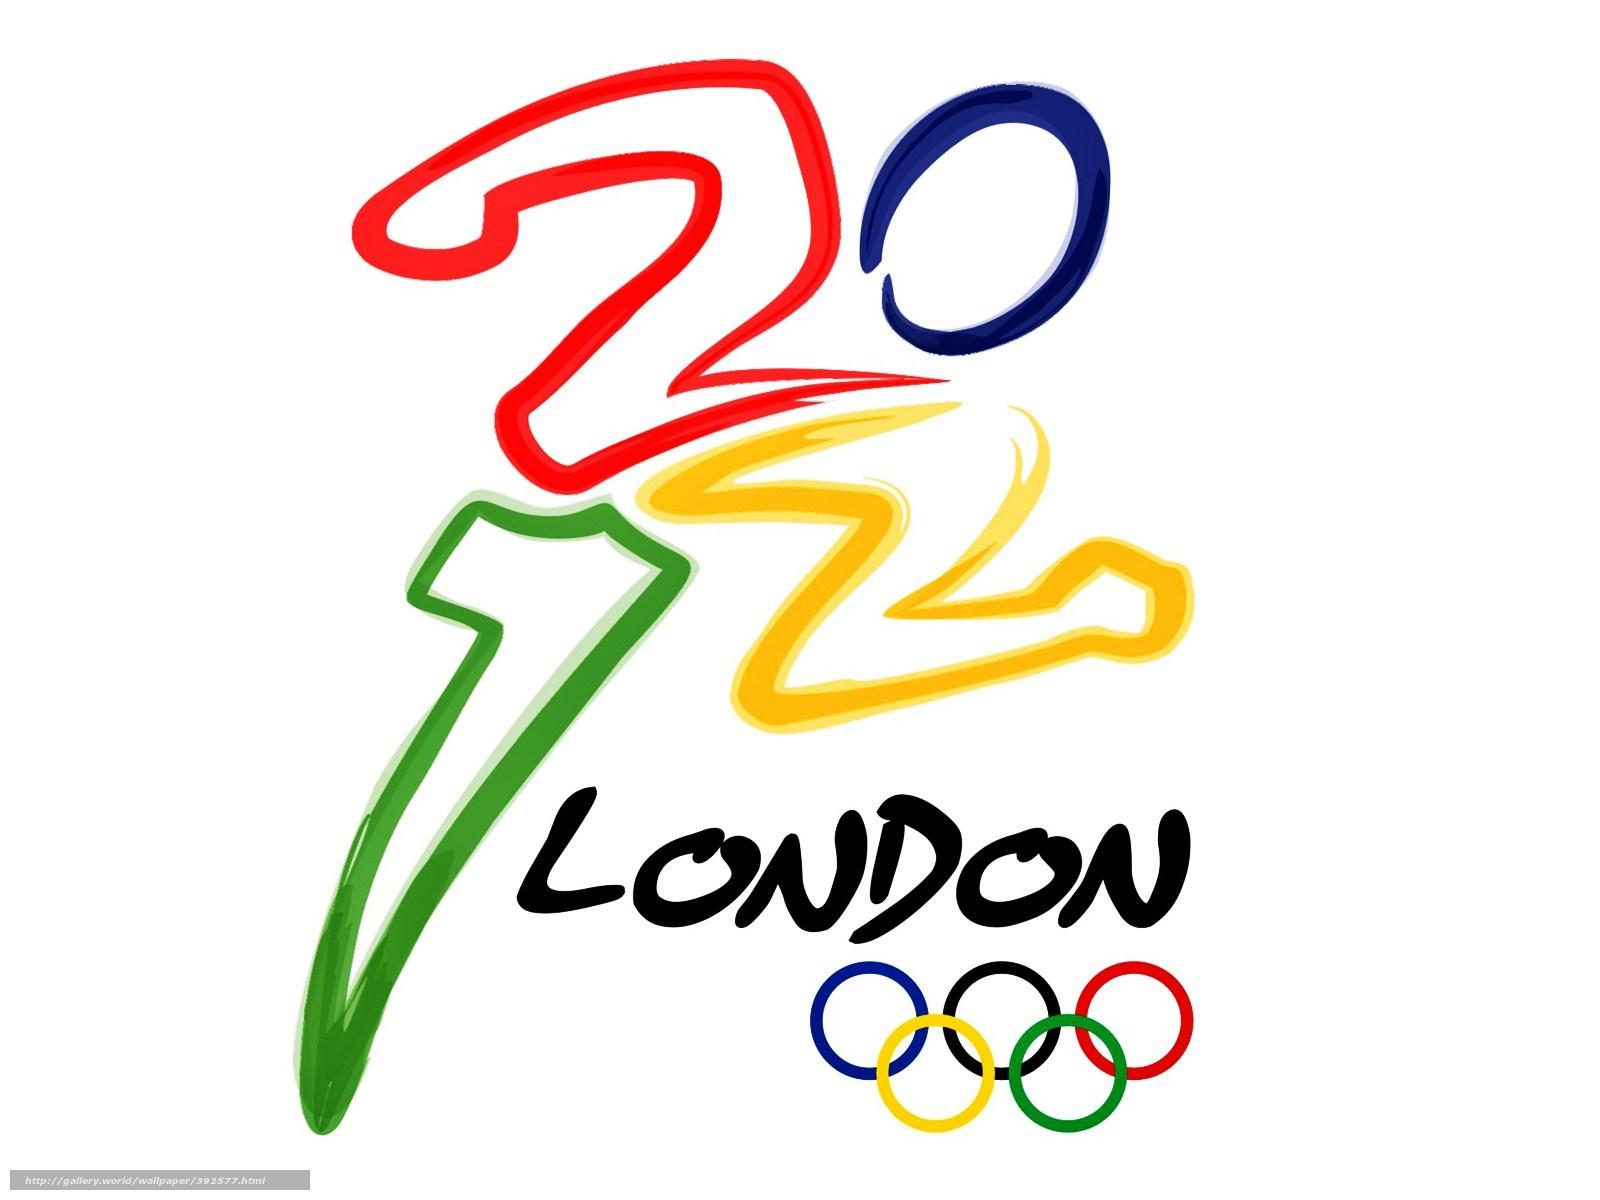 В лондоне 2012 олимпиада 2012 лондон